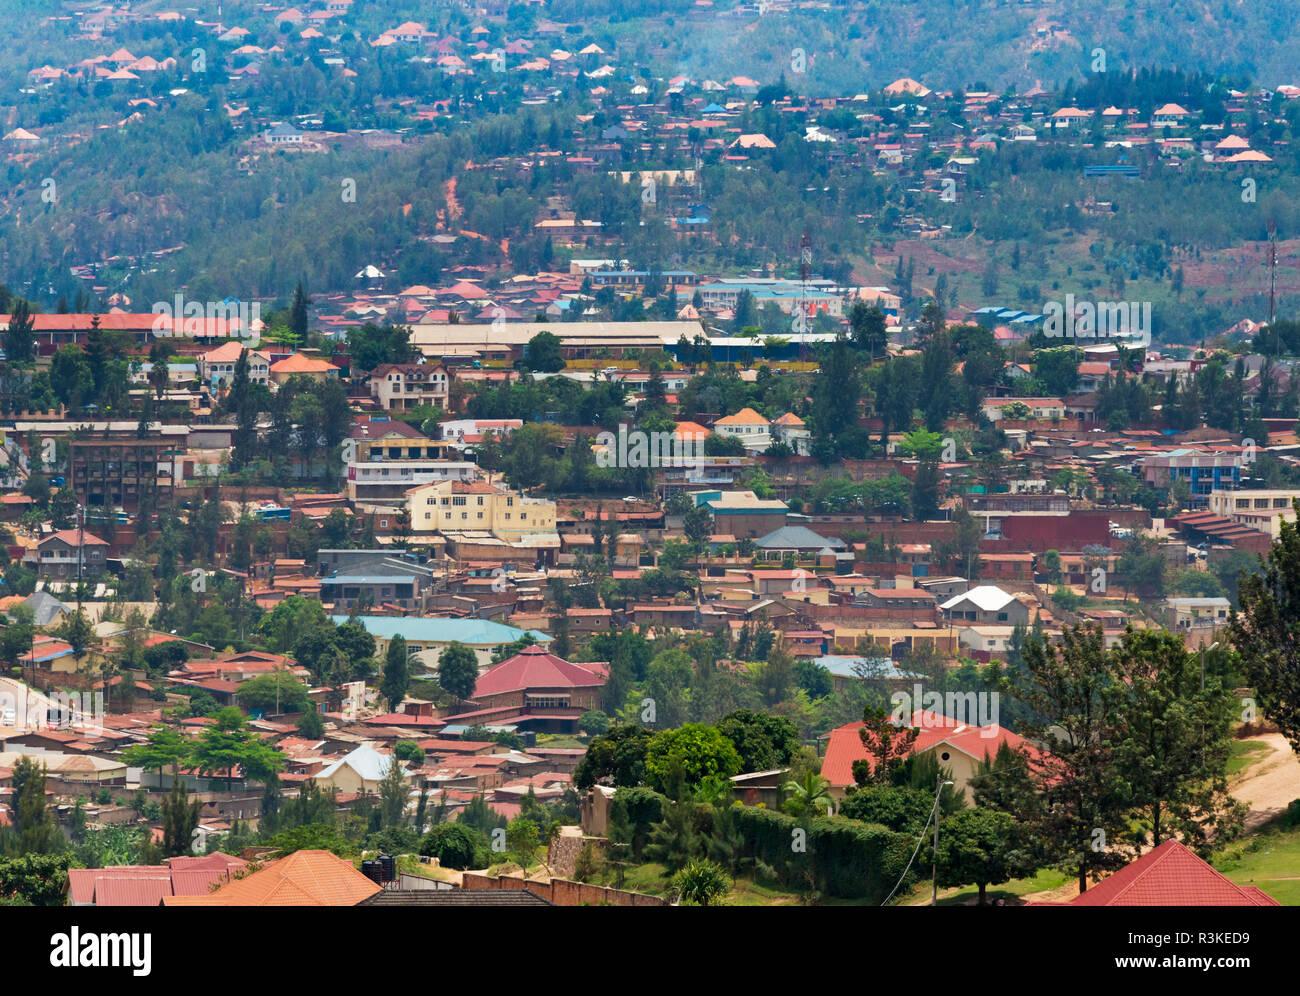 Cityscape, Kigali, Rwanda - Stock Image